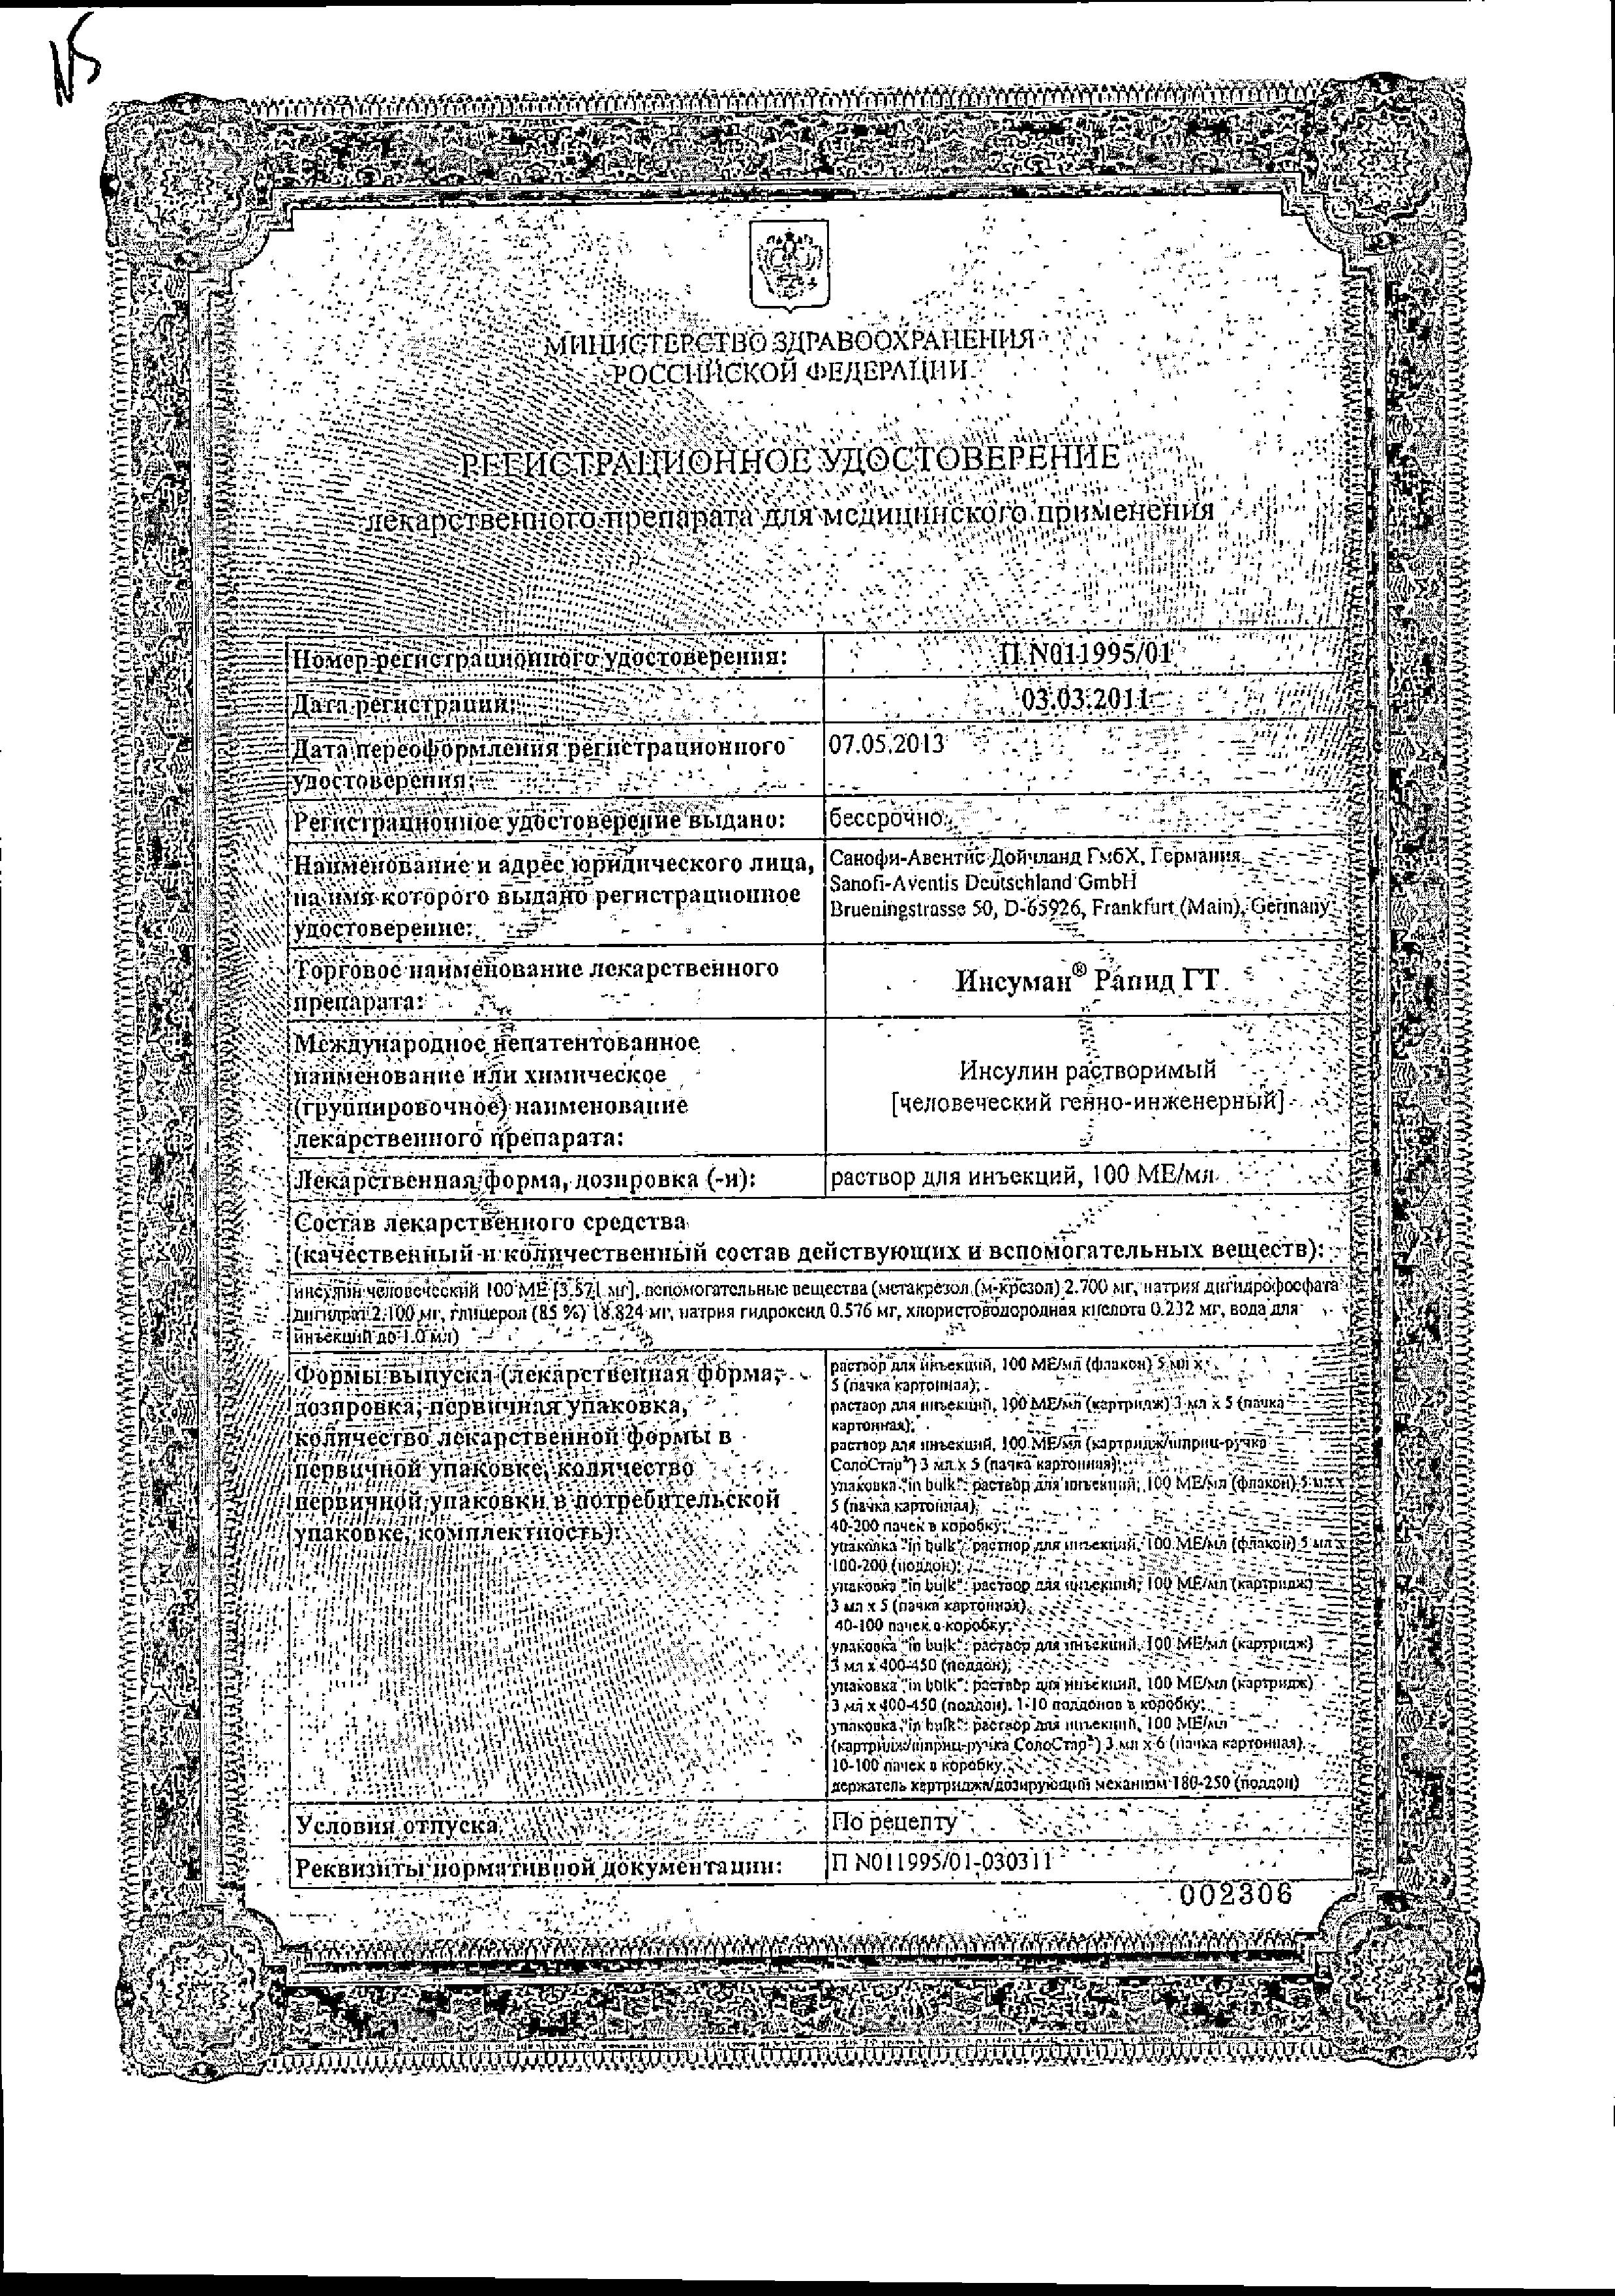 Инсуман Рапид ГТ сертификат